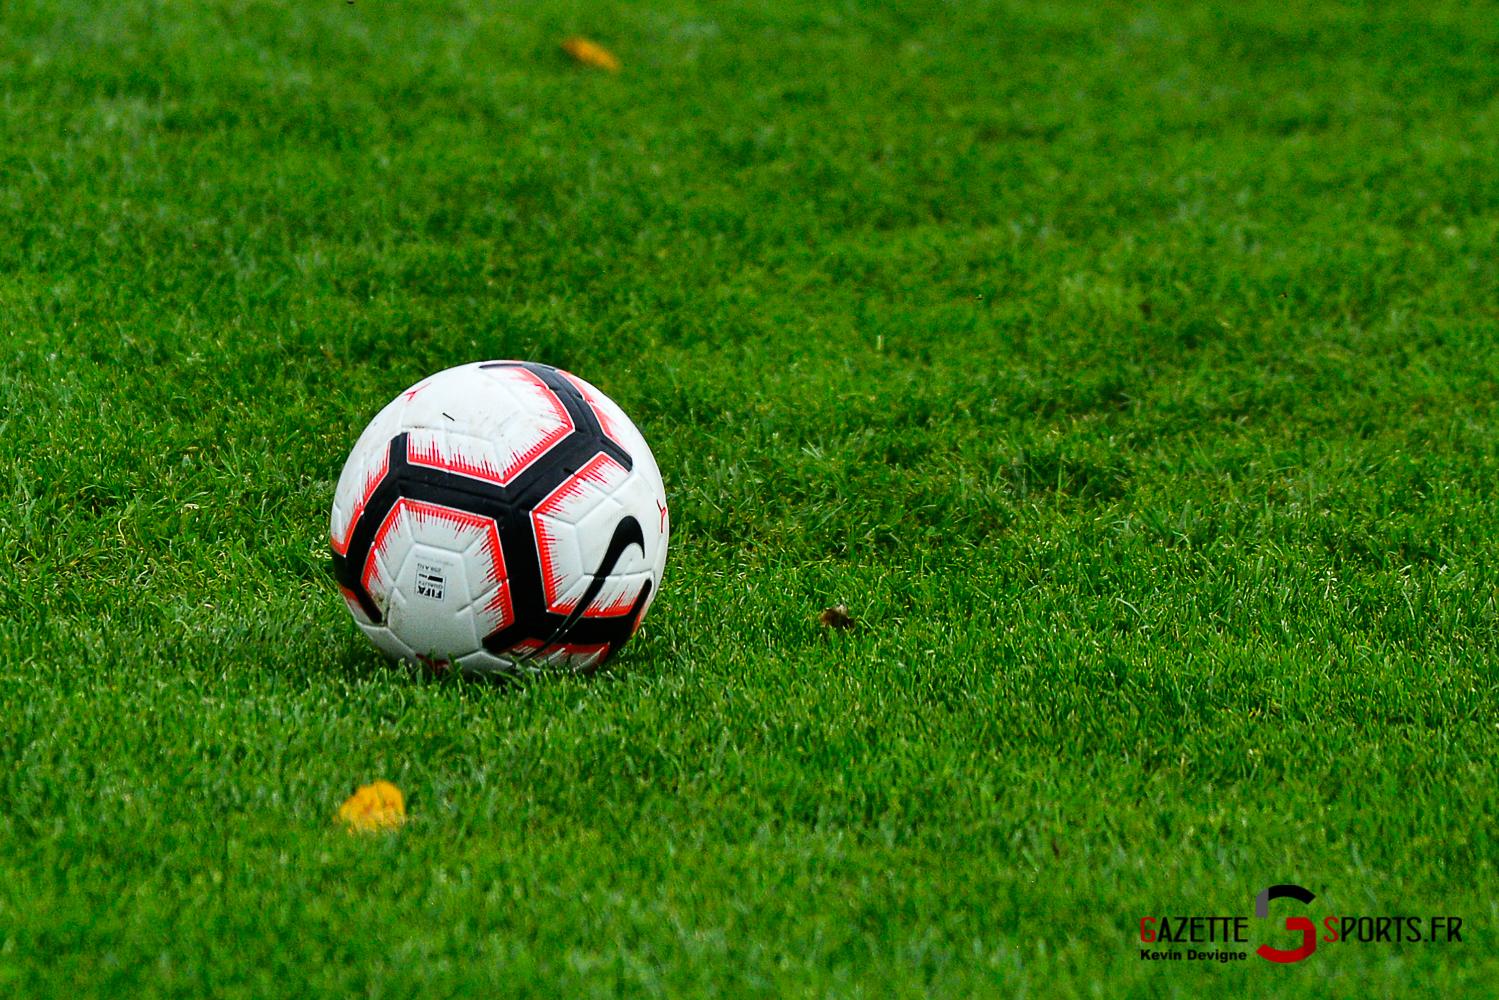 Football Longueau Vs Abeville Kevin Devigne Gazettesports 13